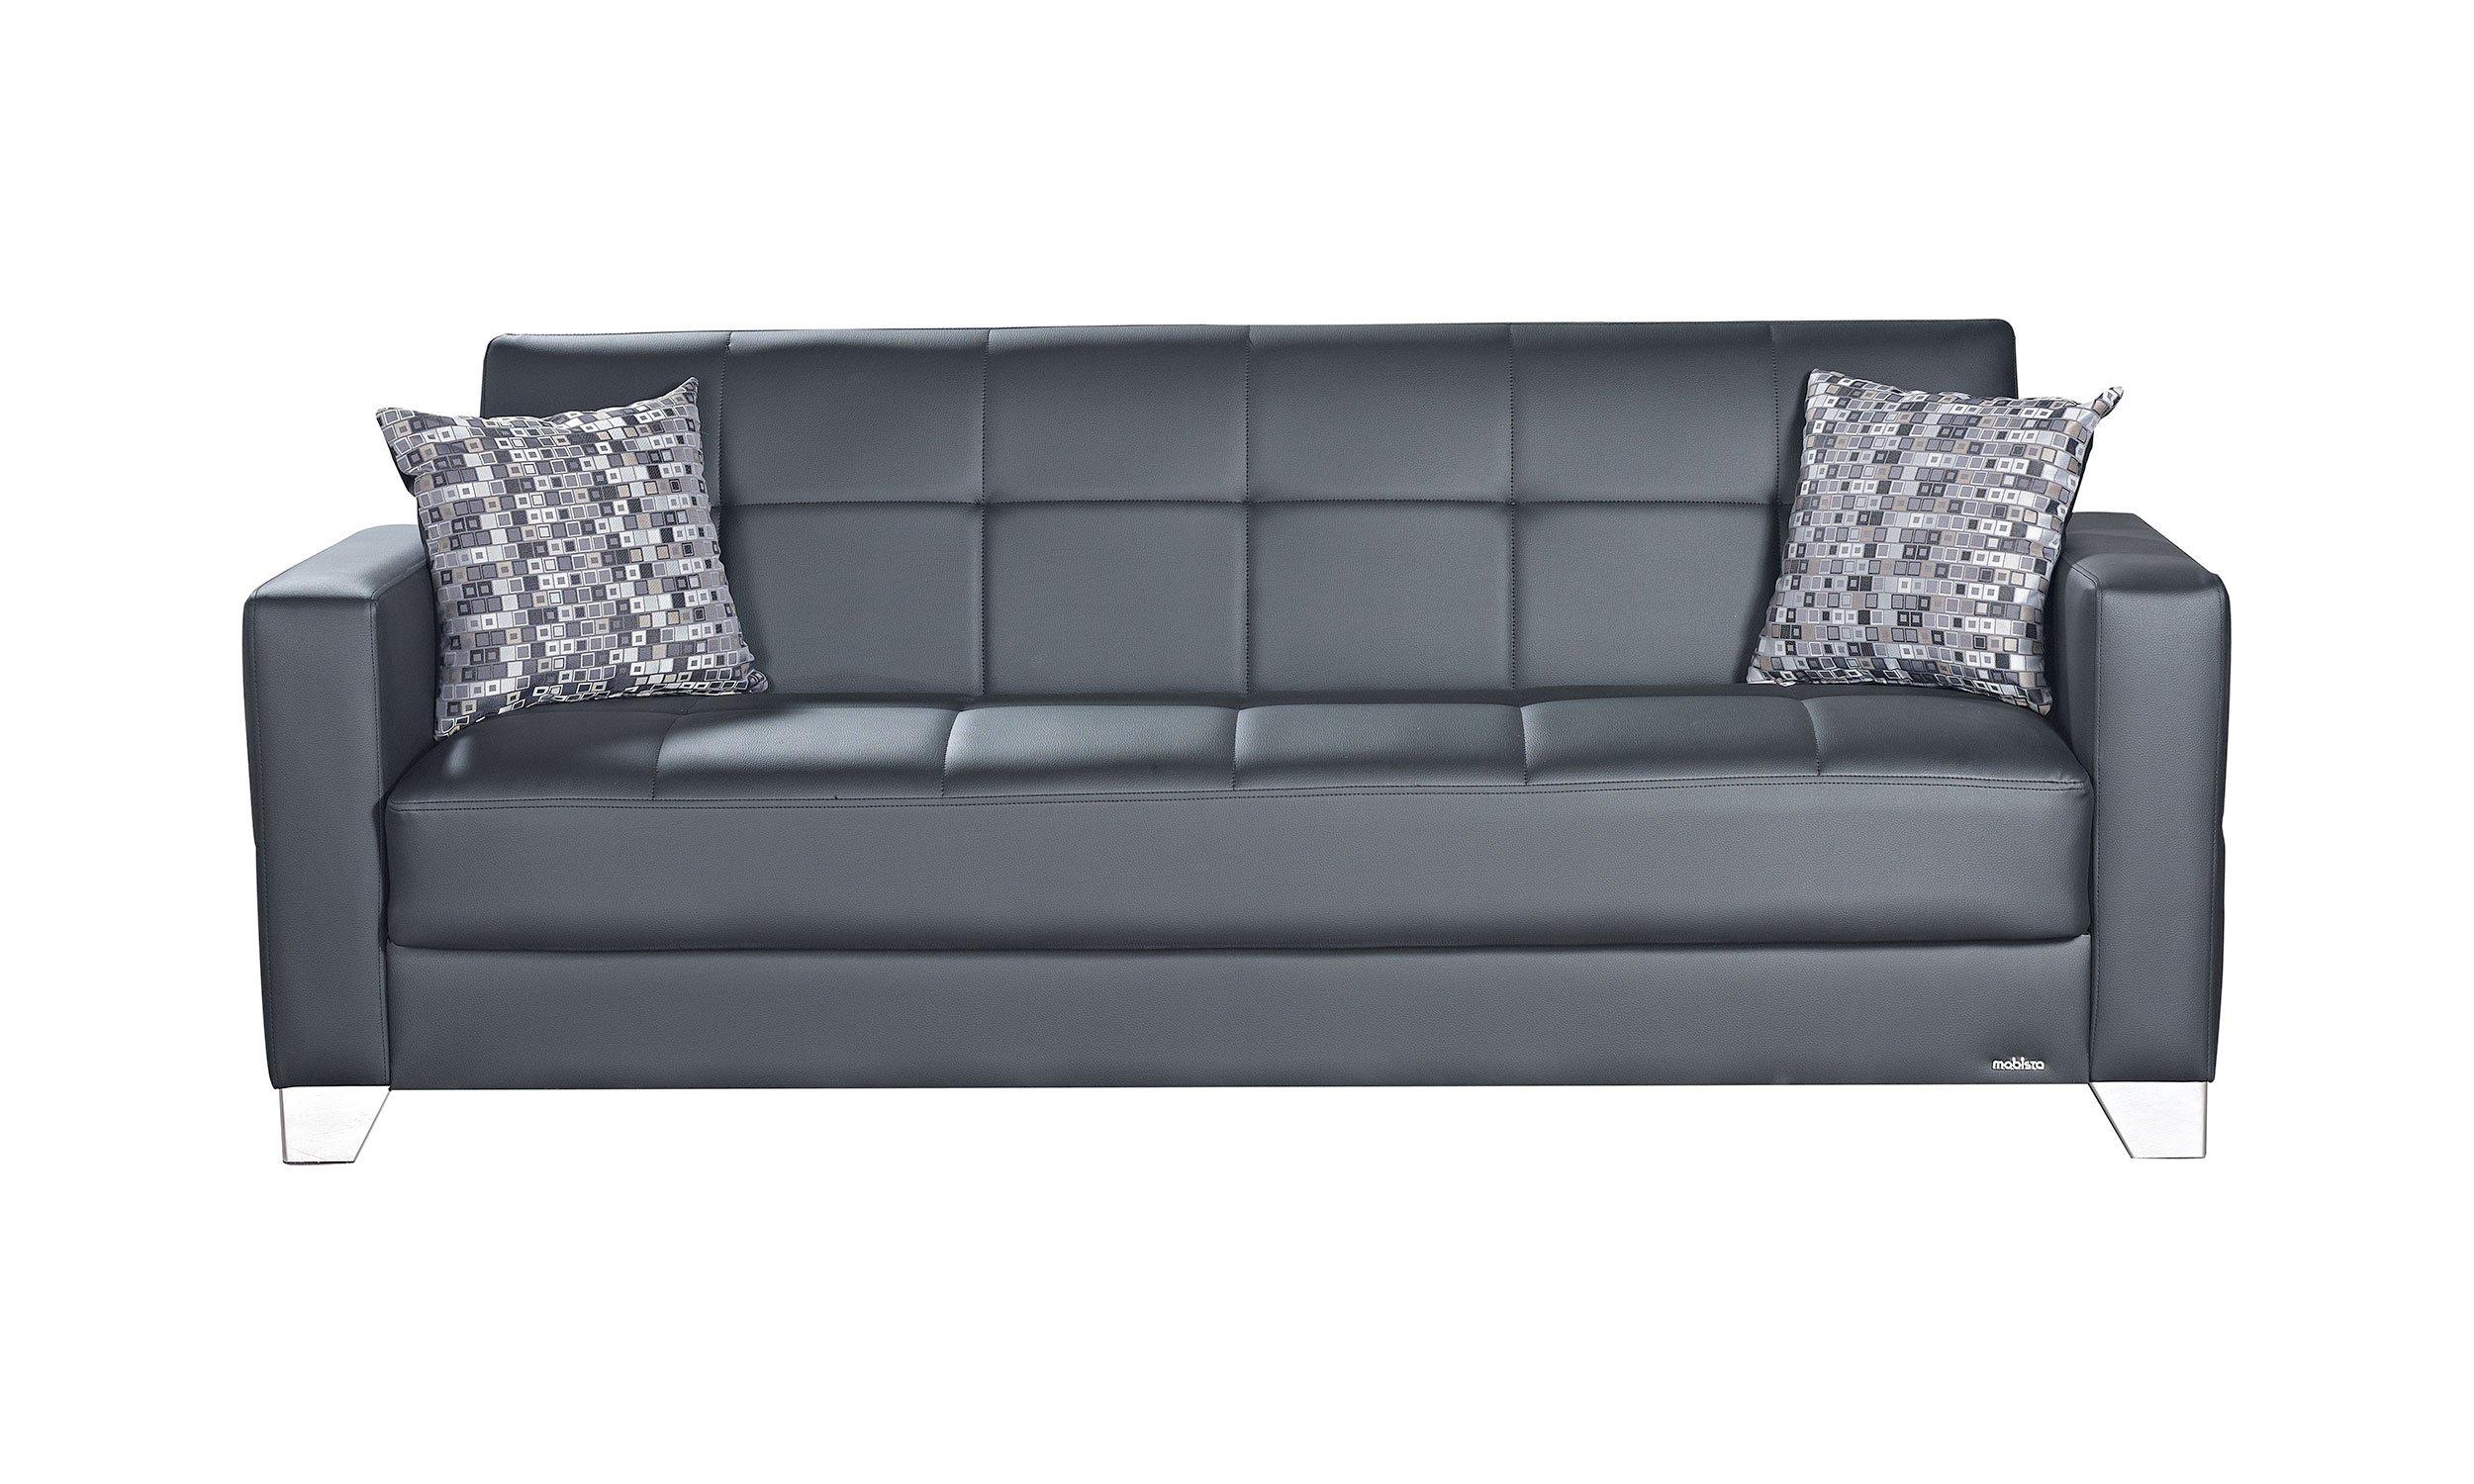 Viva Italia Prestige Black Leatherette Sofa Bed by Mobista